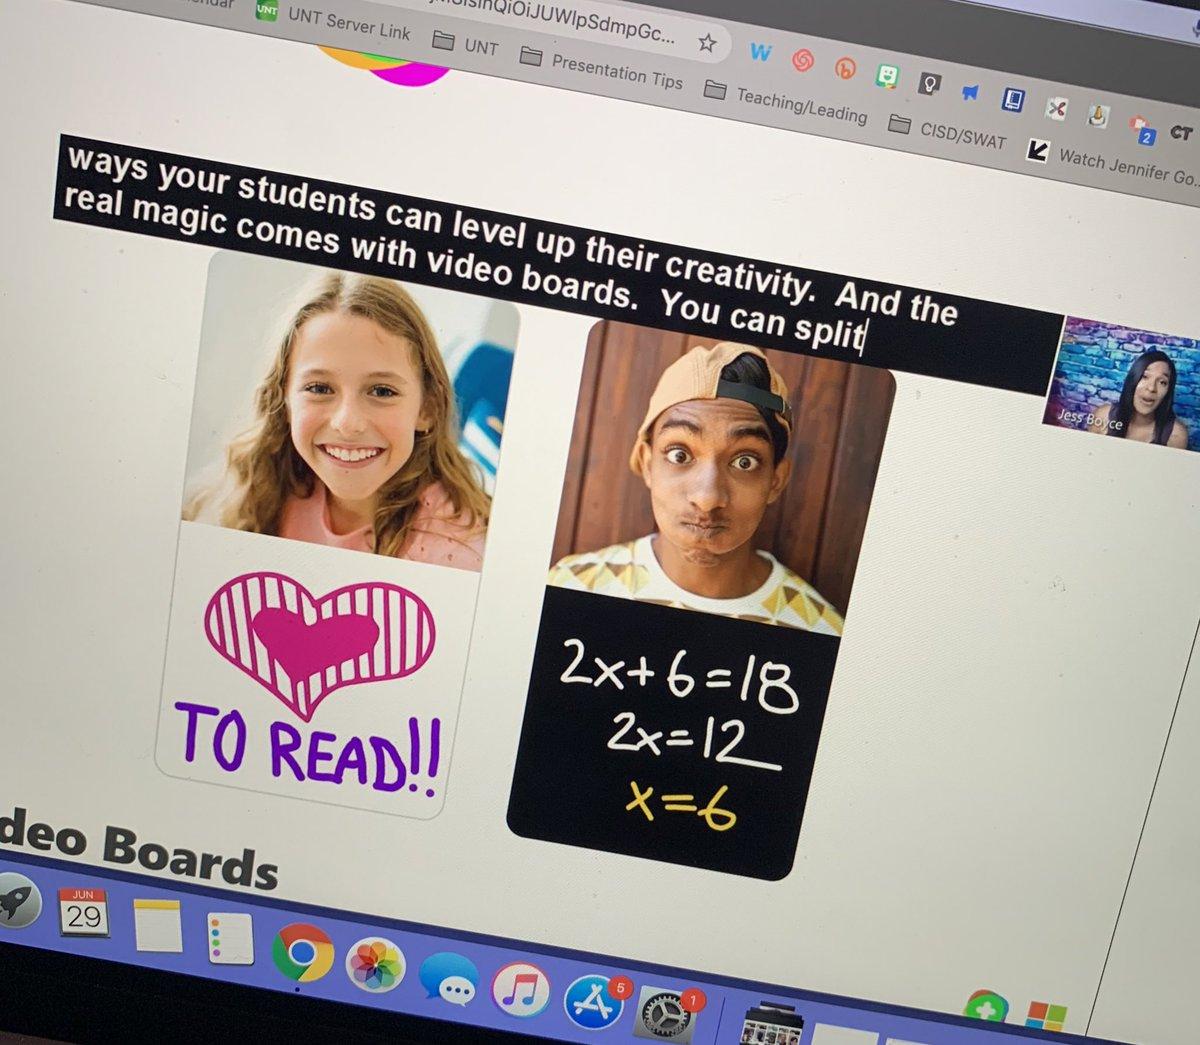 Um video boards anyone?!?! #FlipgridLIVE #FlipgridForAll @cisdSWAT